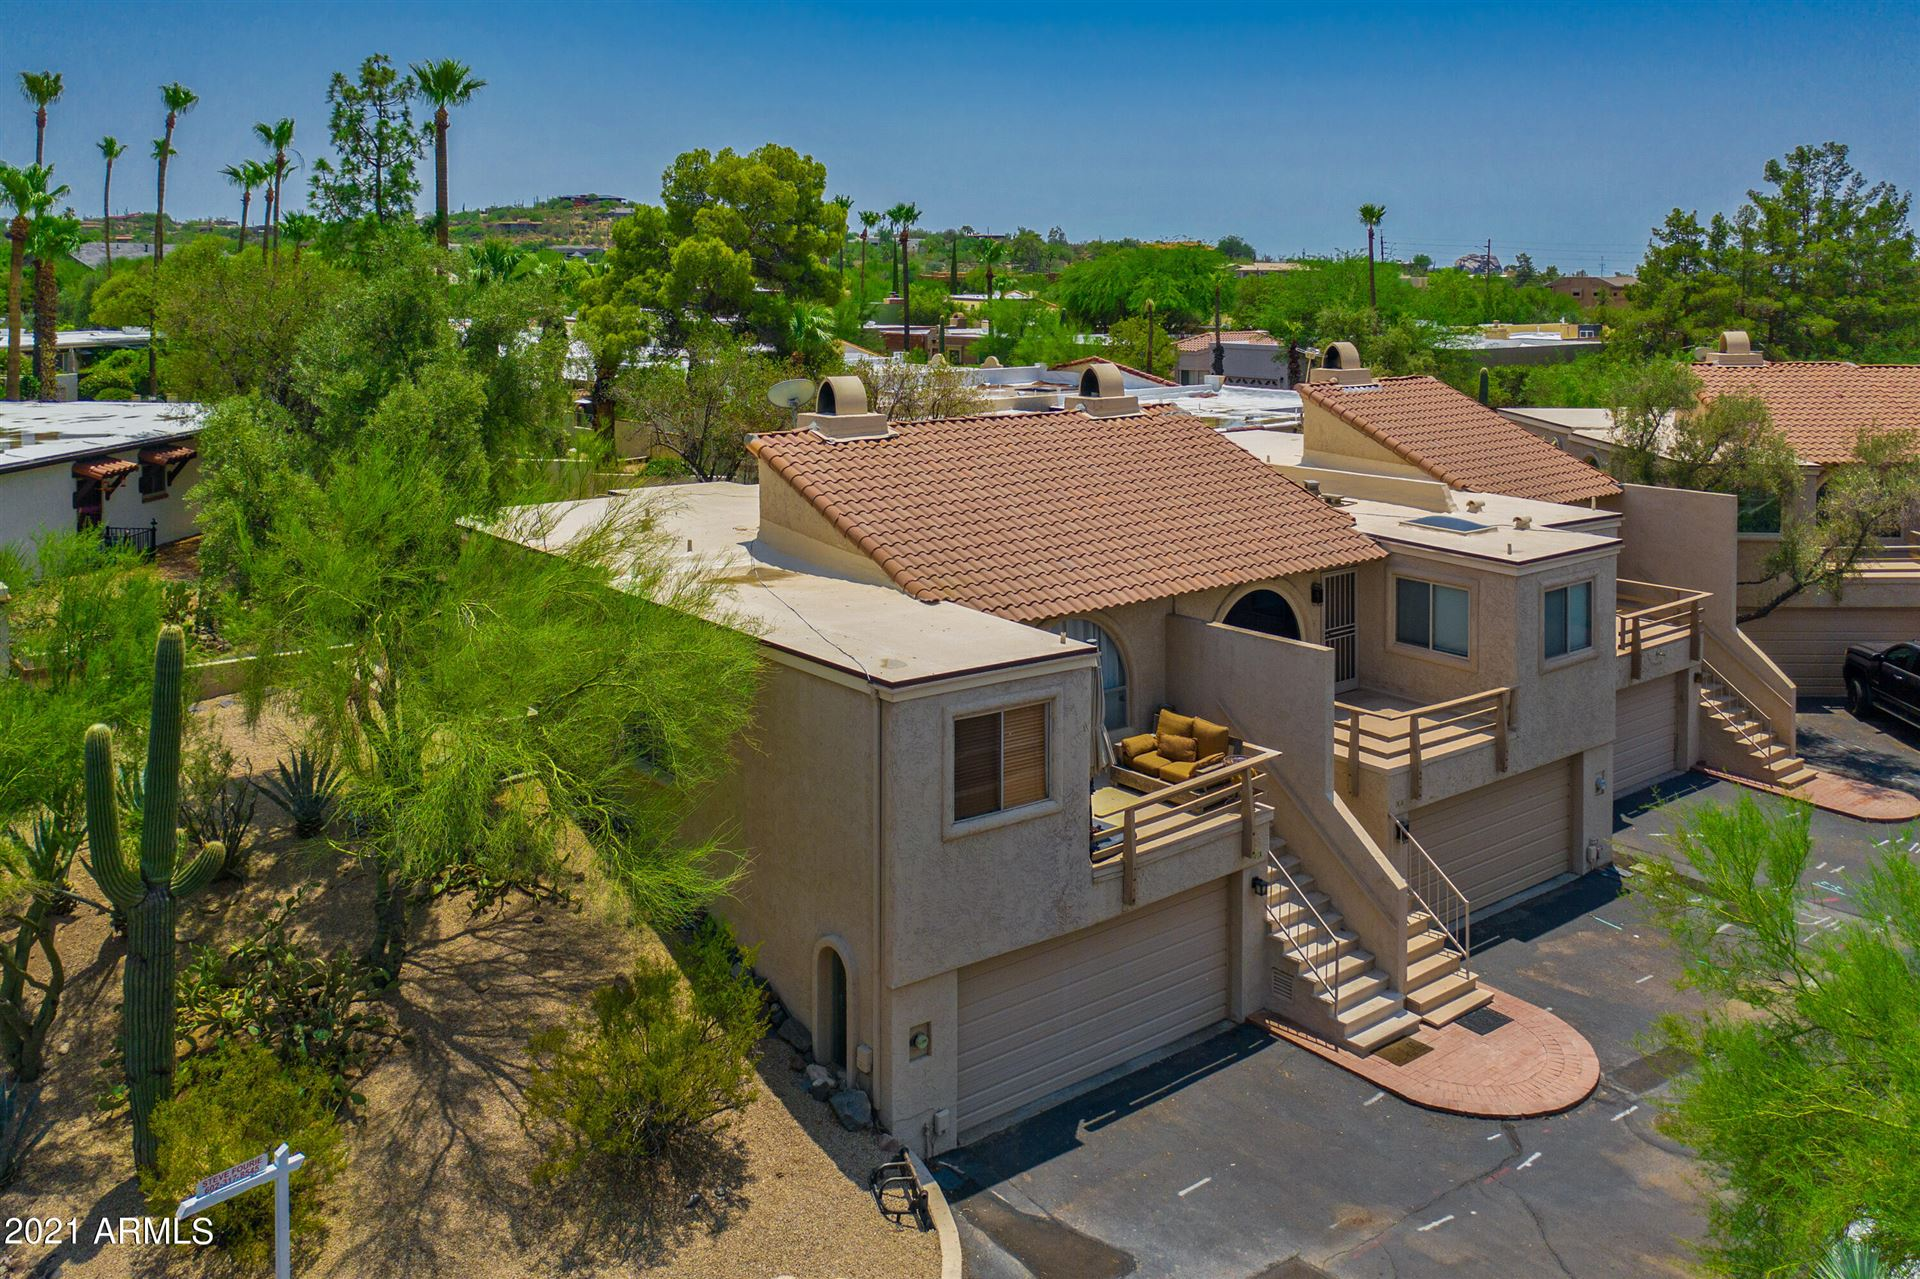 Photo of 7501 E HAPPY HOLLOW Drive #13, Carefree, AZ 85377 (MLS # 6253469)